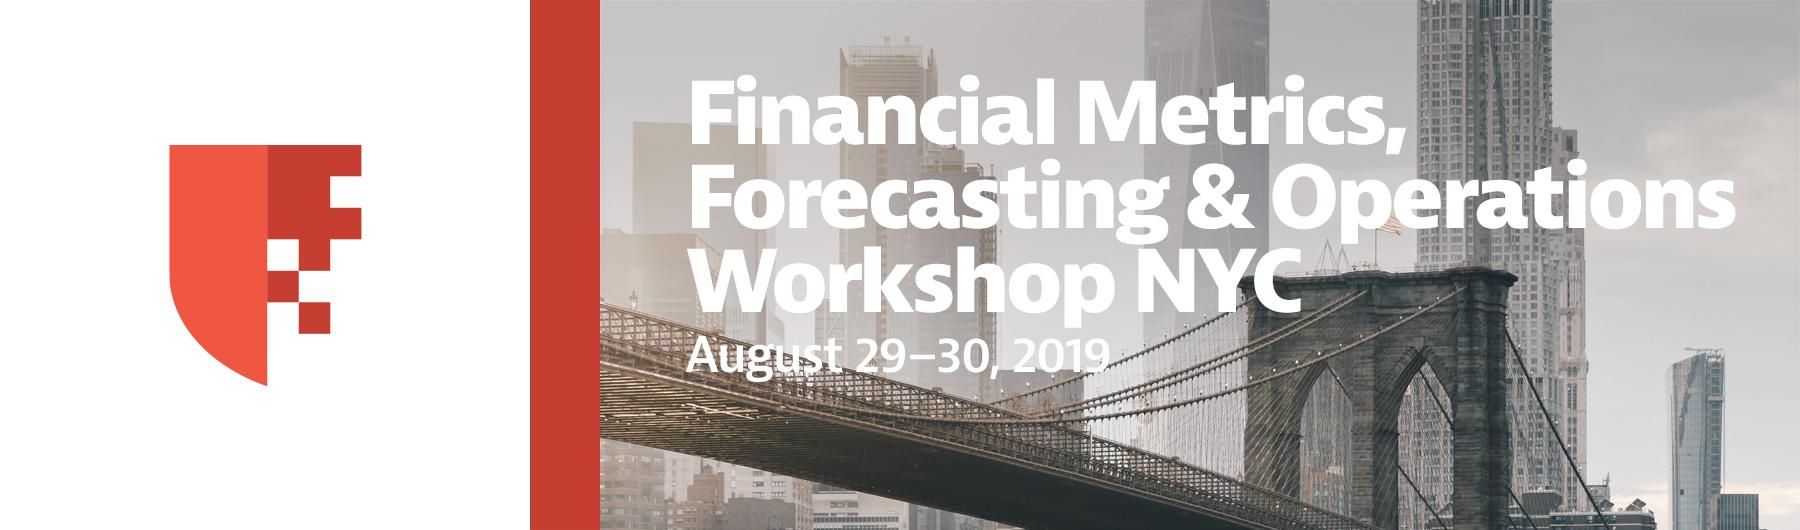 Financial Metrics, Forecasting & Operations Workshop NYC